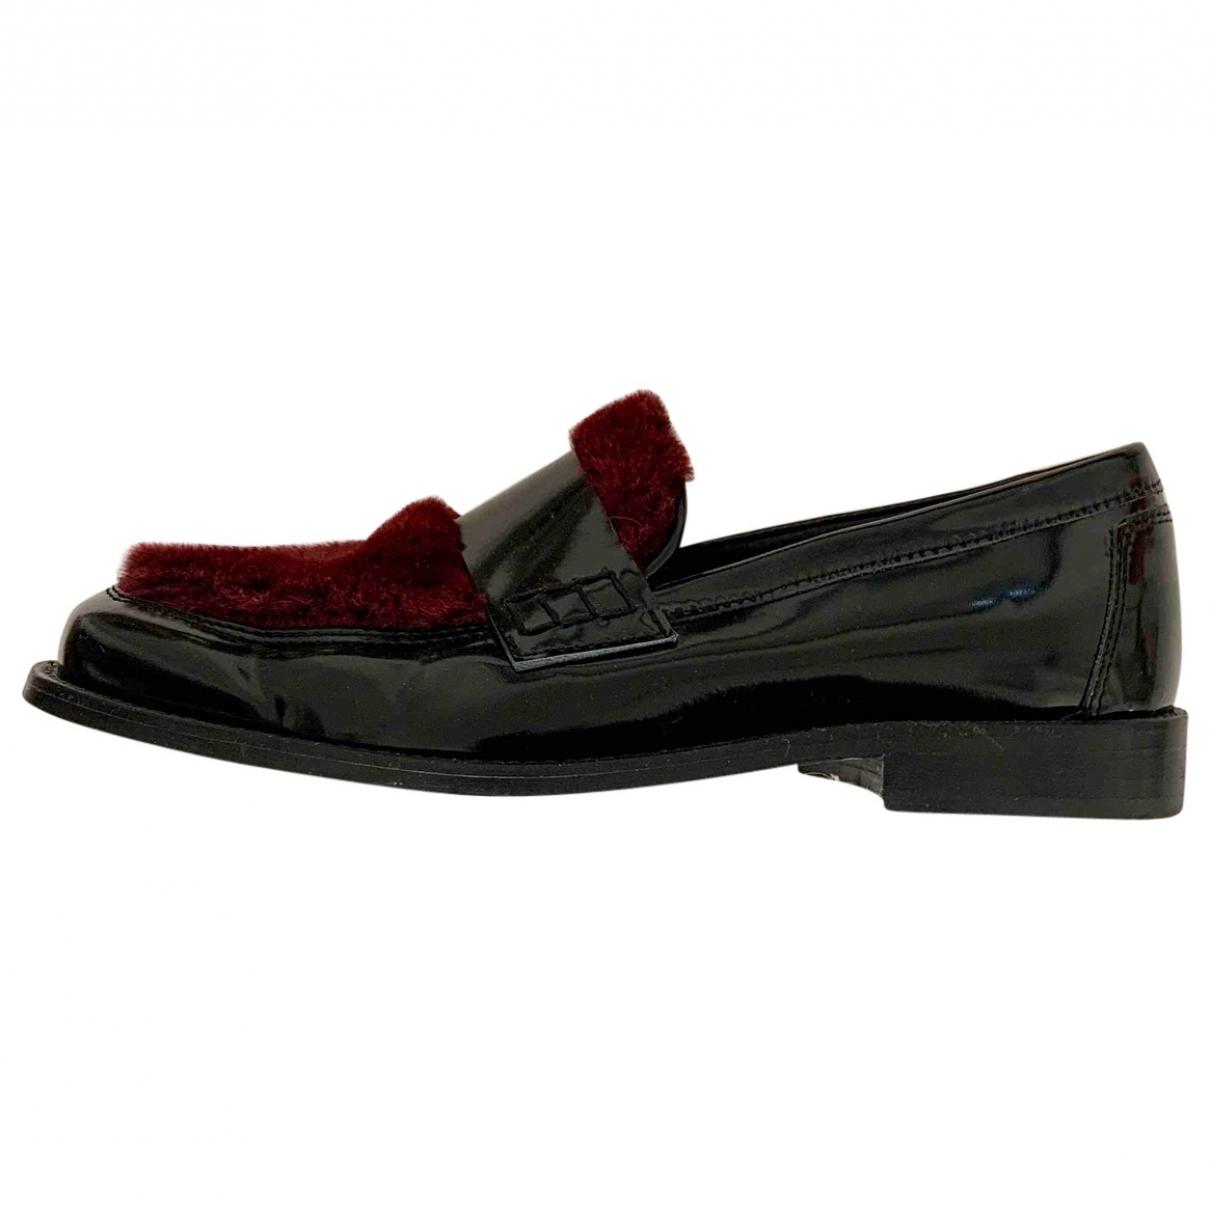 Joshua Sanders \N Black Patent leather Flats for Women 37 IT